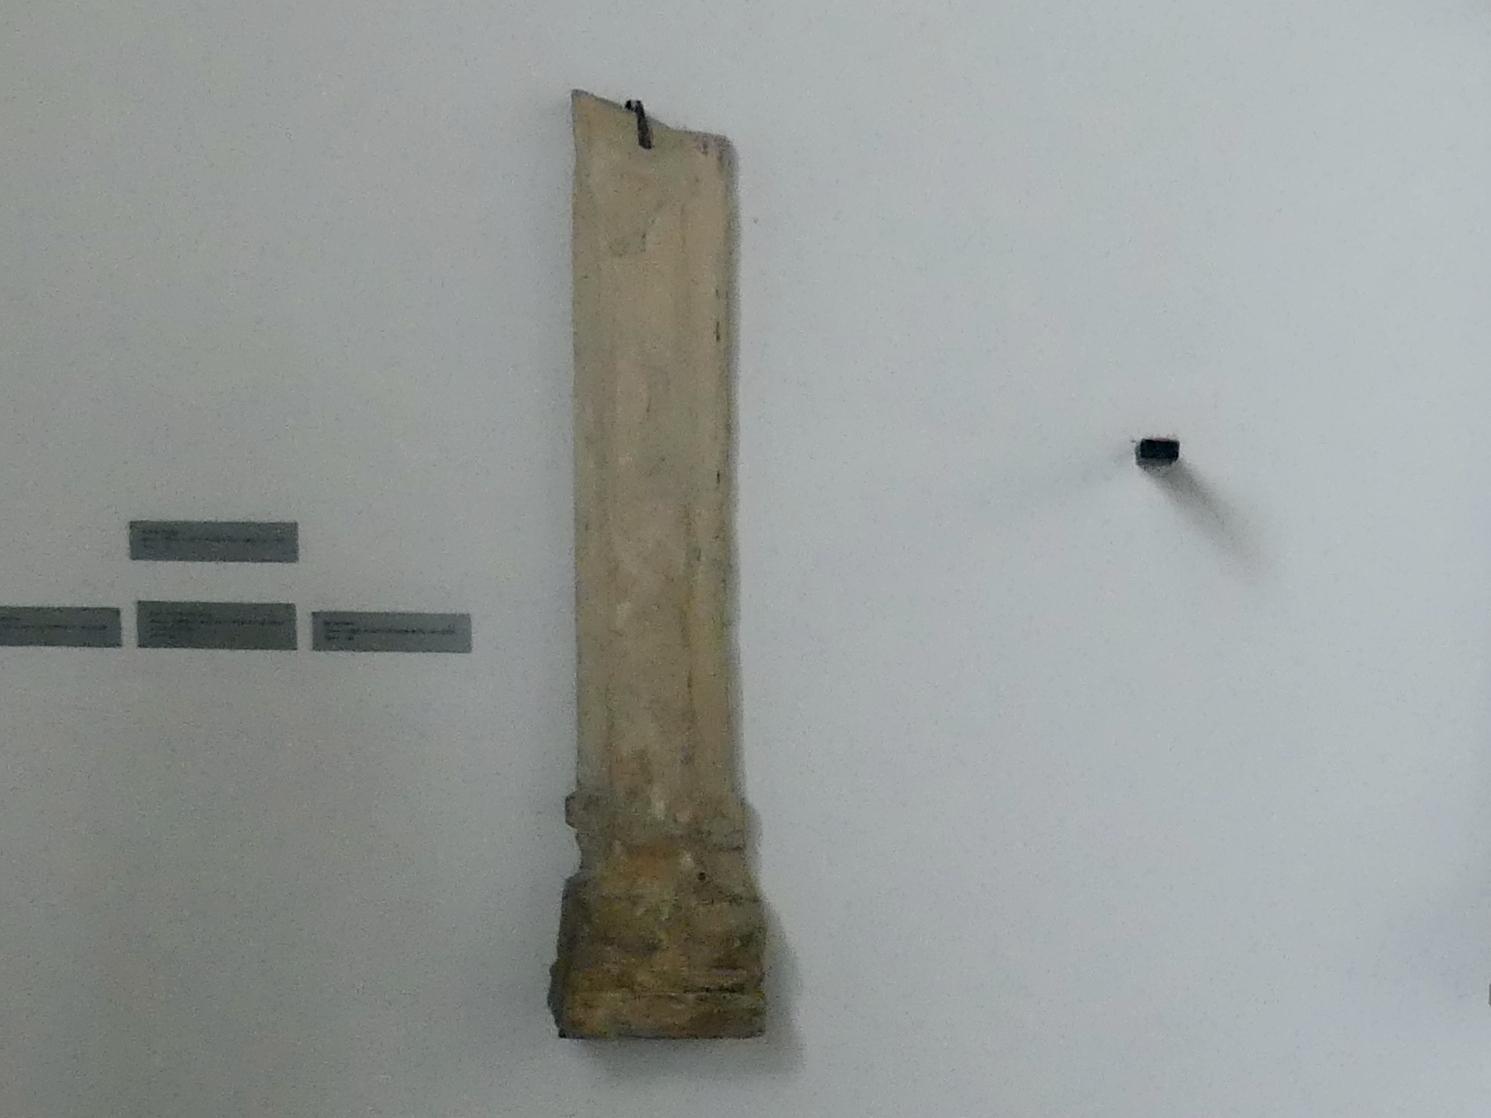 Fragment einer Halbsäule, 2. Hälfte 12. Jhd.